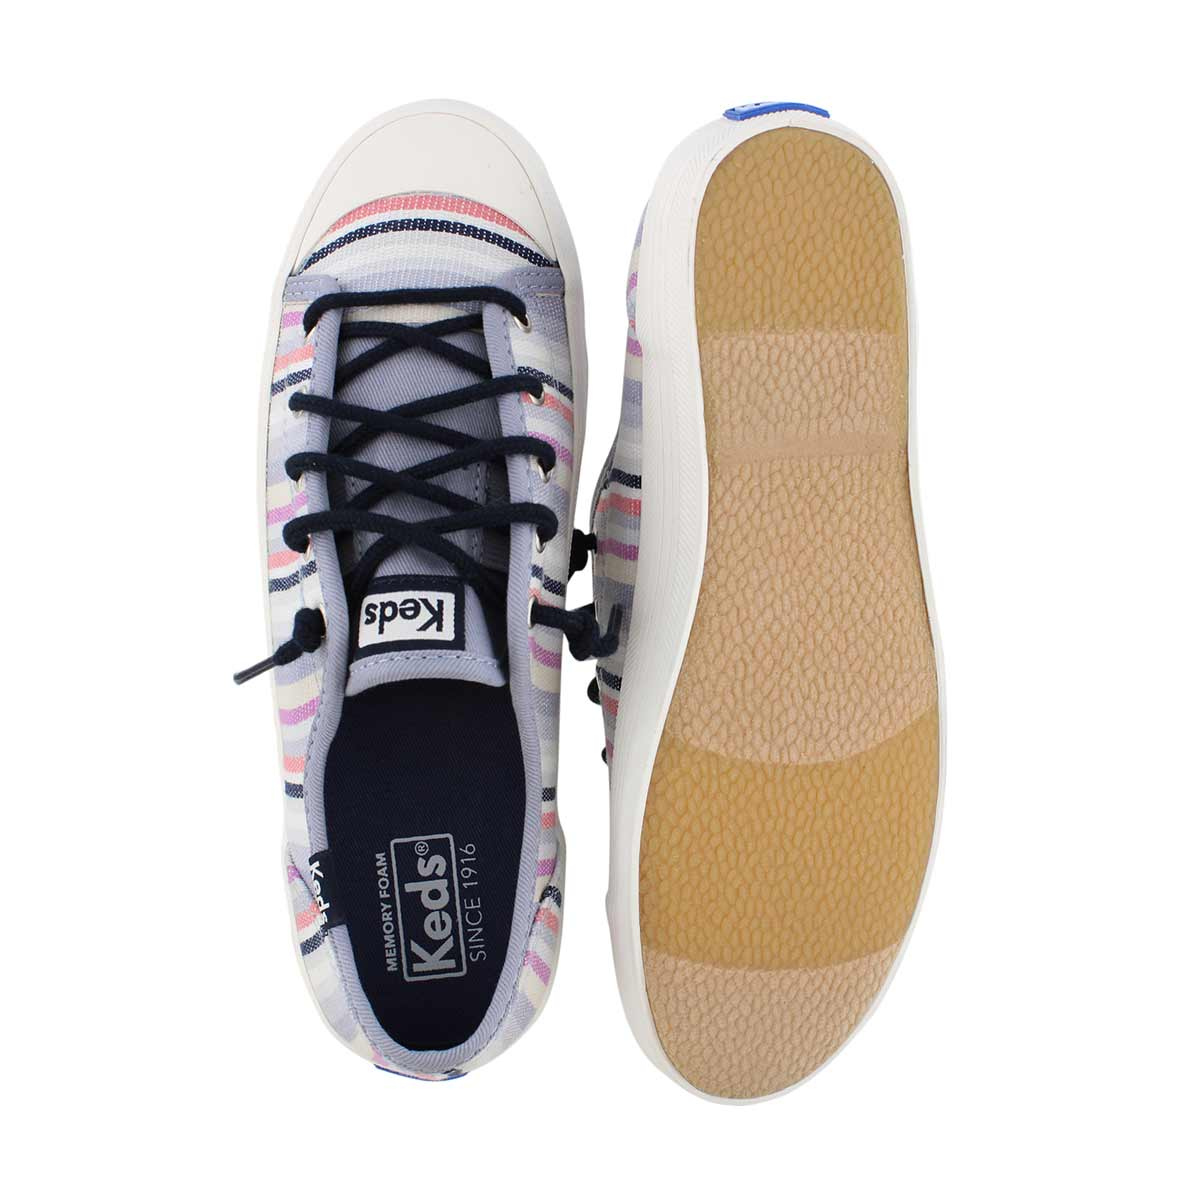 Grls Kickstart Seasonal mlt strp sneaker